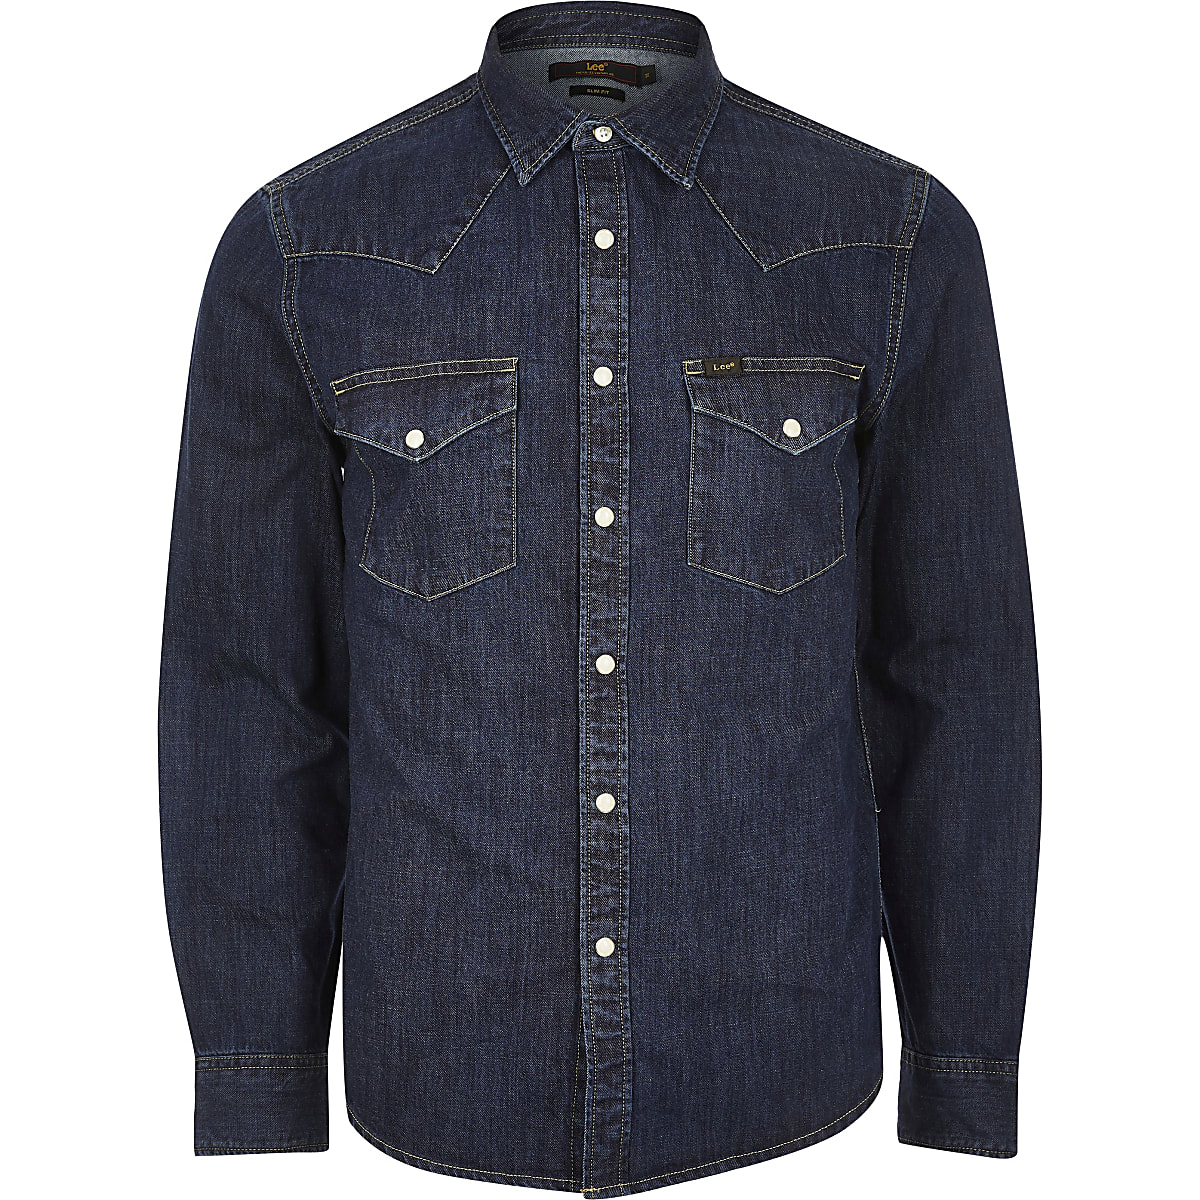 1538fa29509 Lee dark blue slim fit denim western shirt - Long Sleeve Shirts ...